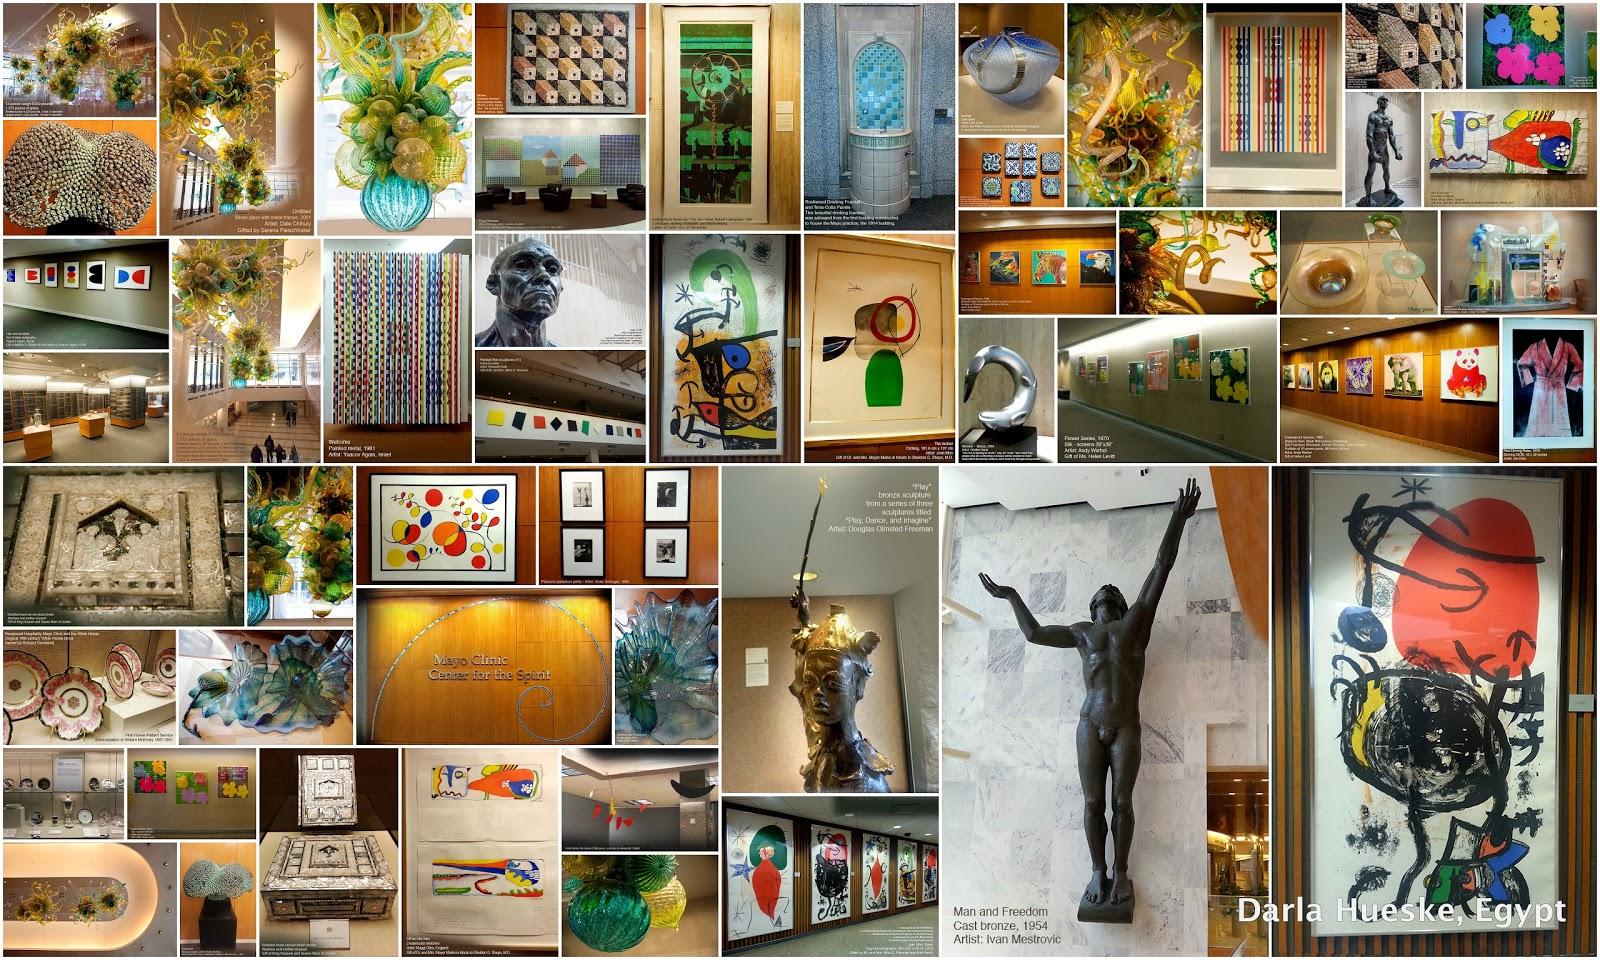 art at mayo clinic in rochester minnesota, darla hueske